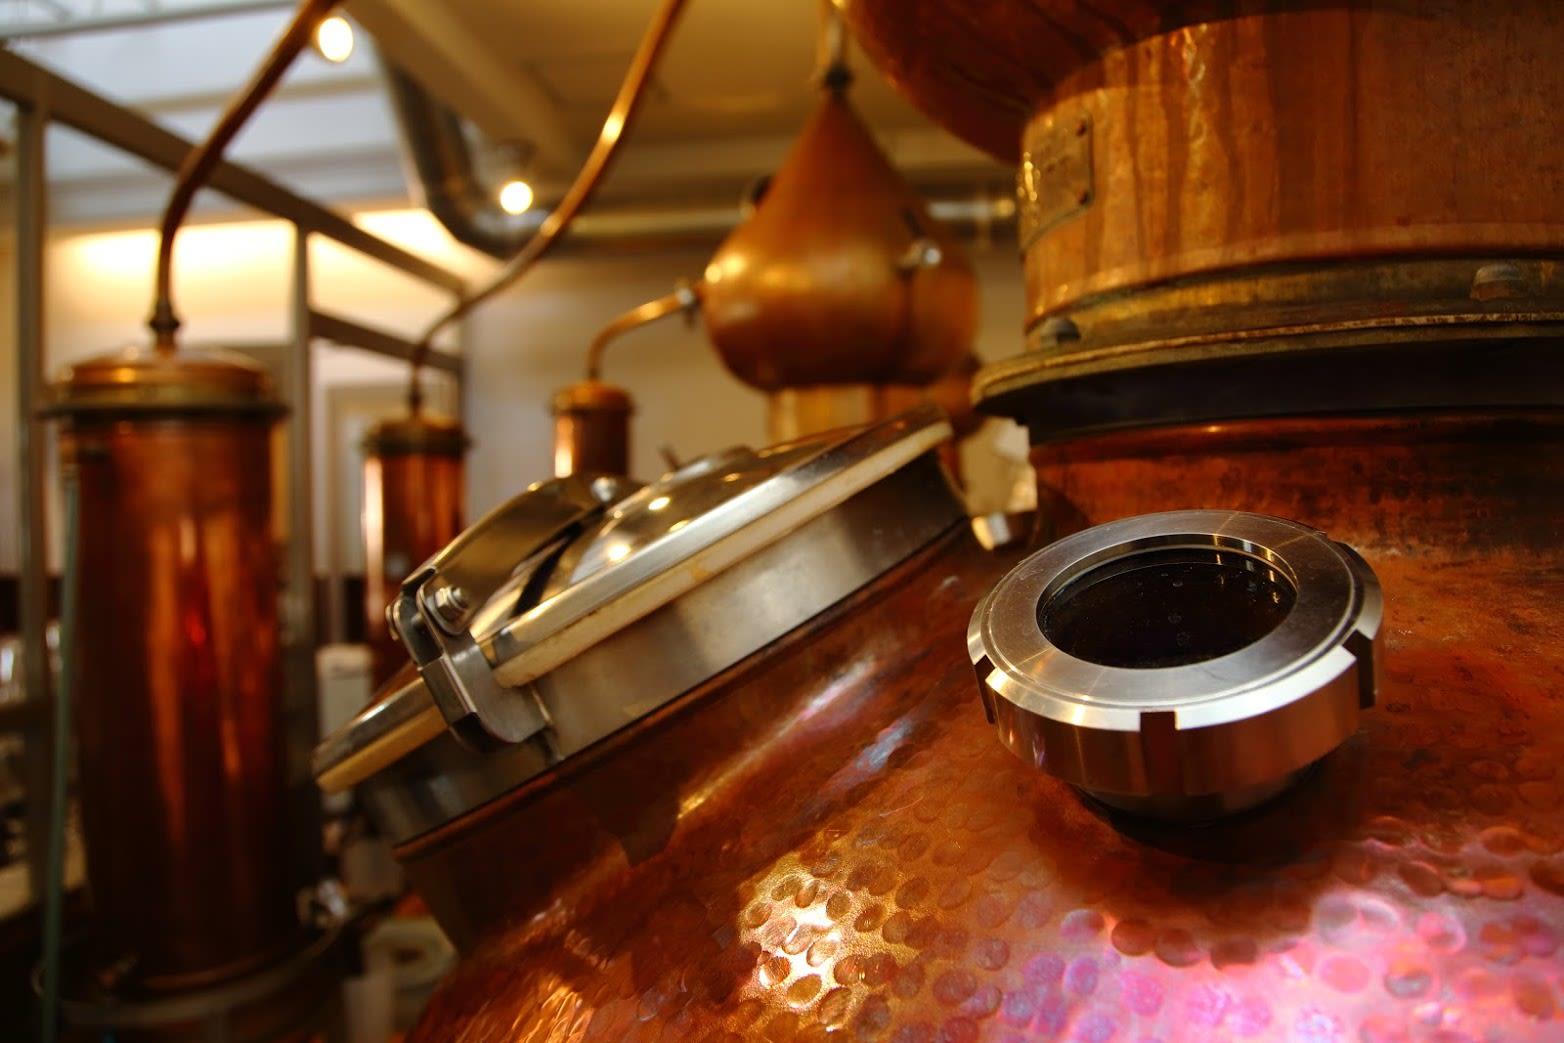 Nagahama Roman Beer & Whisky Tasting Brewery Tour in Shiga